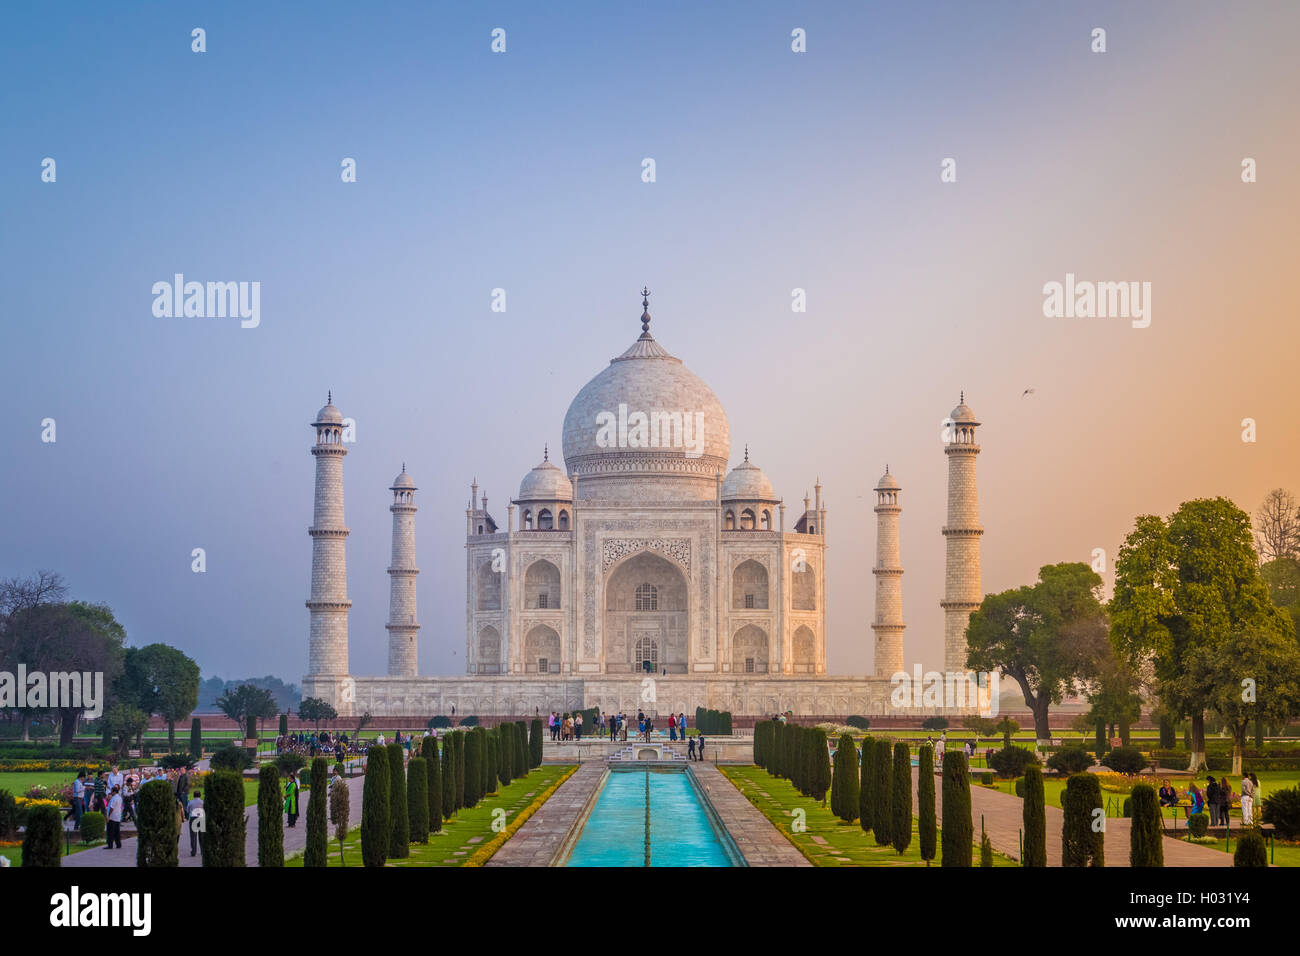 AGRA, Indien - 28. Februar 2015: Ansicht des Taj Mahal vor dem großen Tor. Südseite. Stockbild